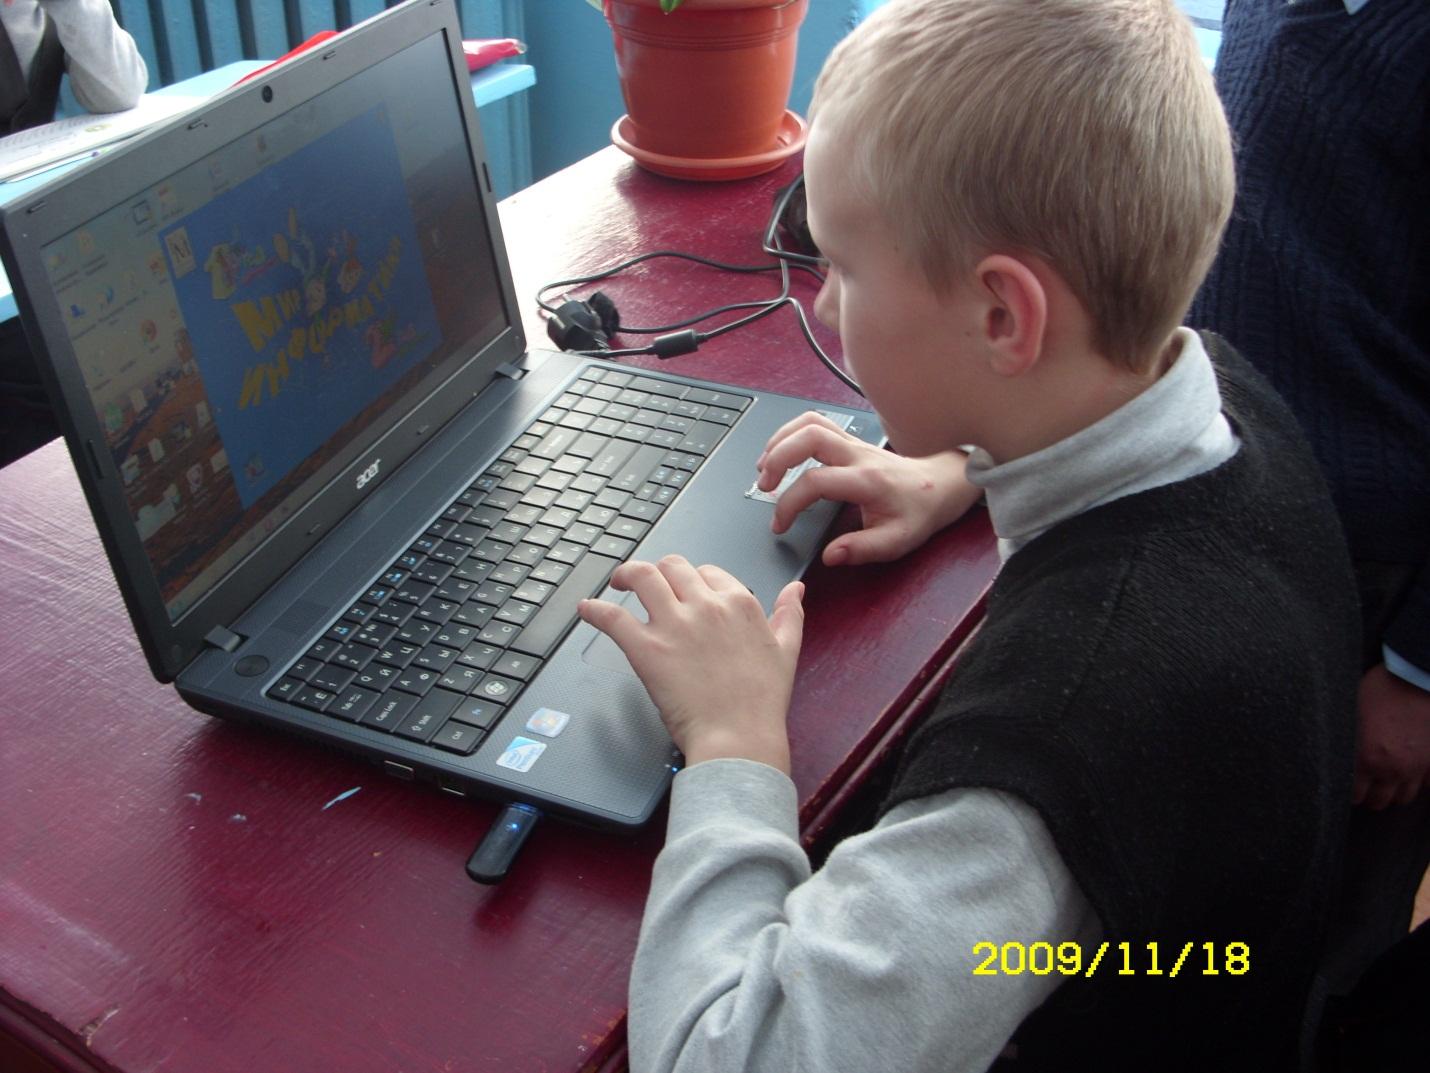 C:\Users\Павел\Desktop\Волкова Т.А\ВОЛКОВА Т.А. Безопасность в Интернете\SN852850.JPG